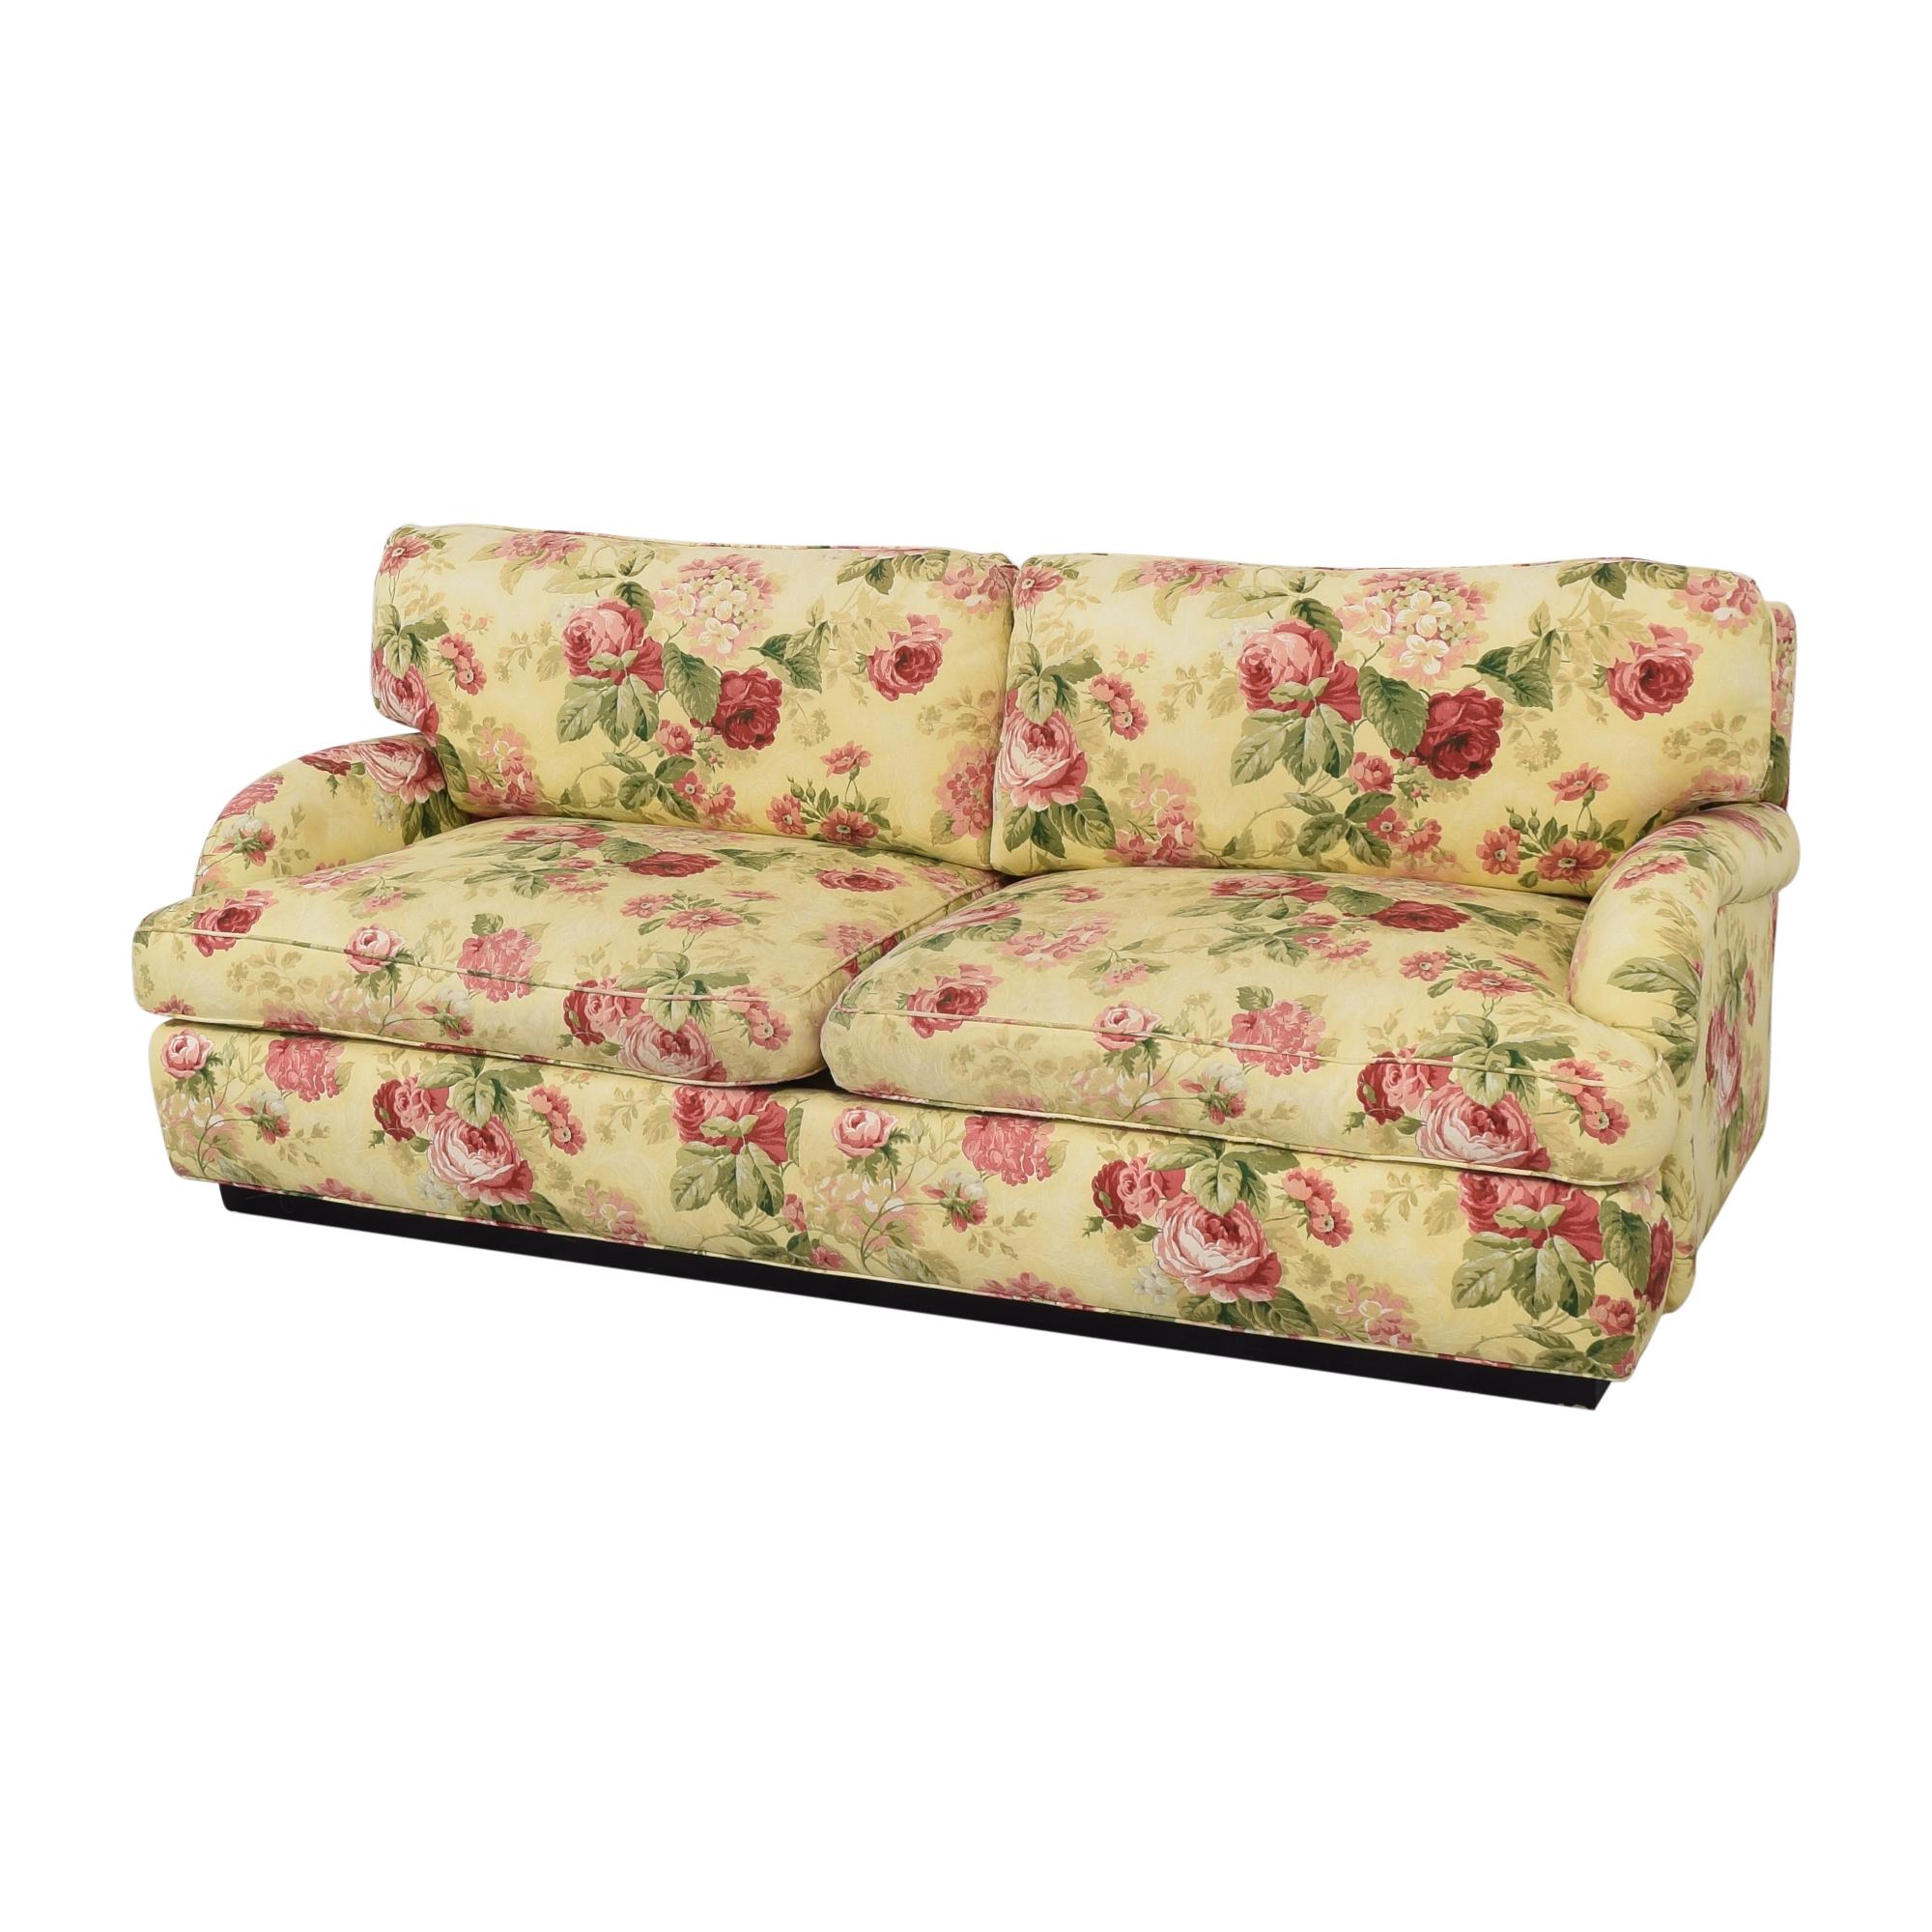 Greenbaum Interiors Greenbaum Two Cushion Sofa